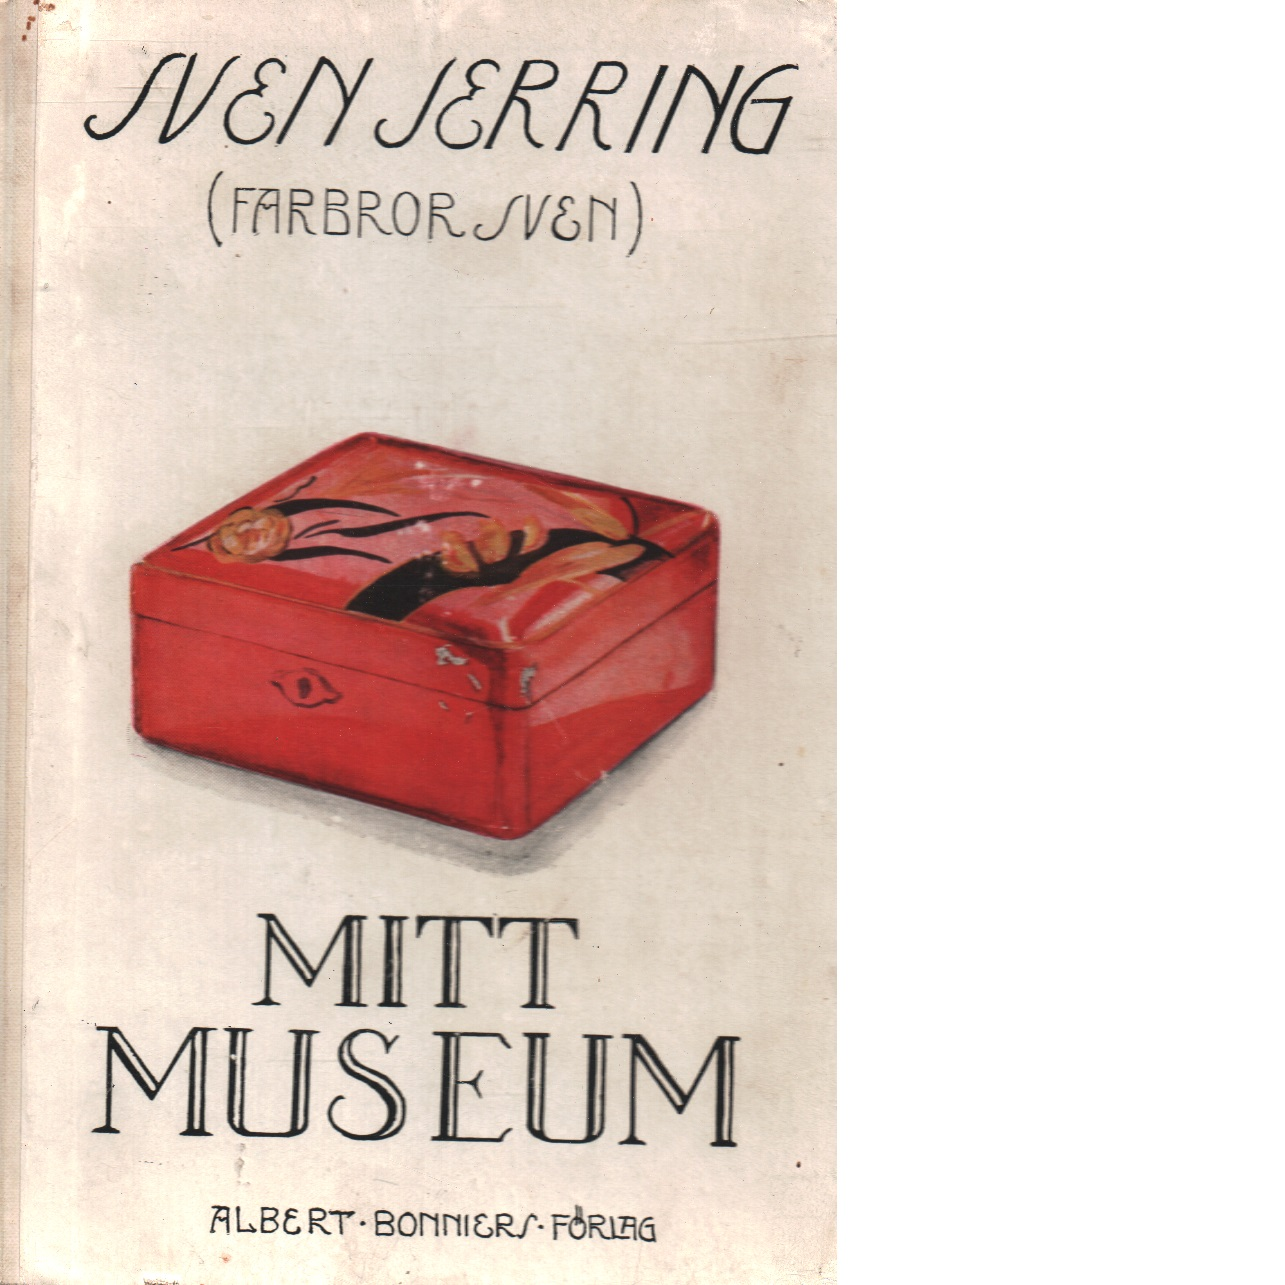 Mitt museum - Jerring, Sven